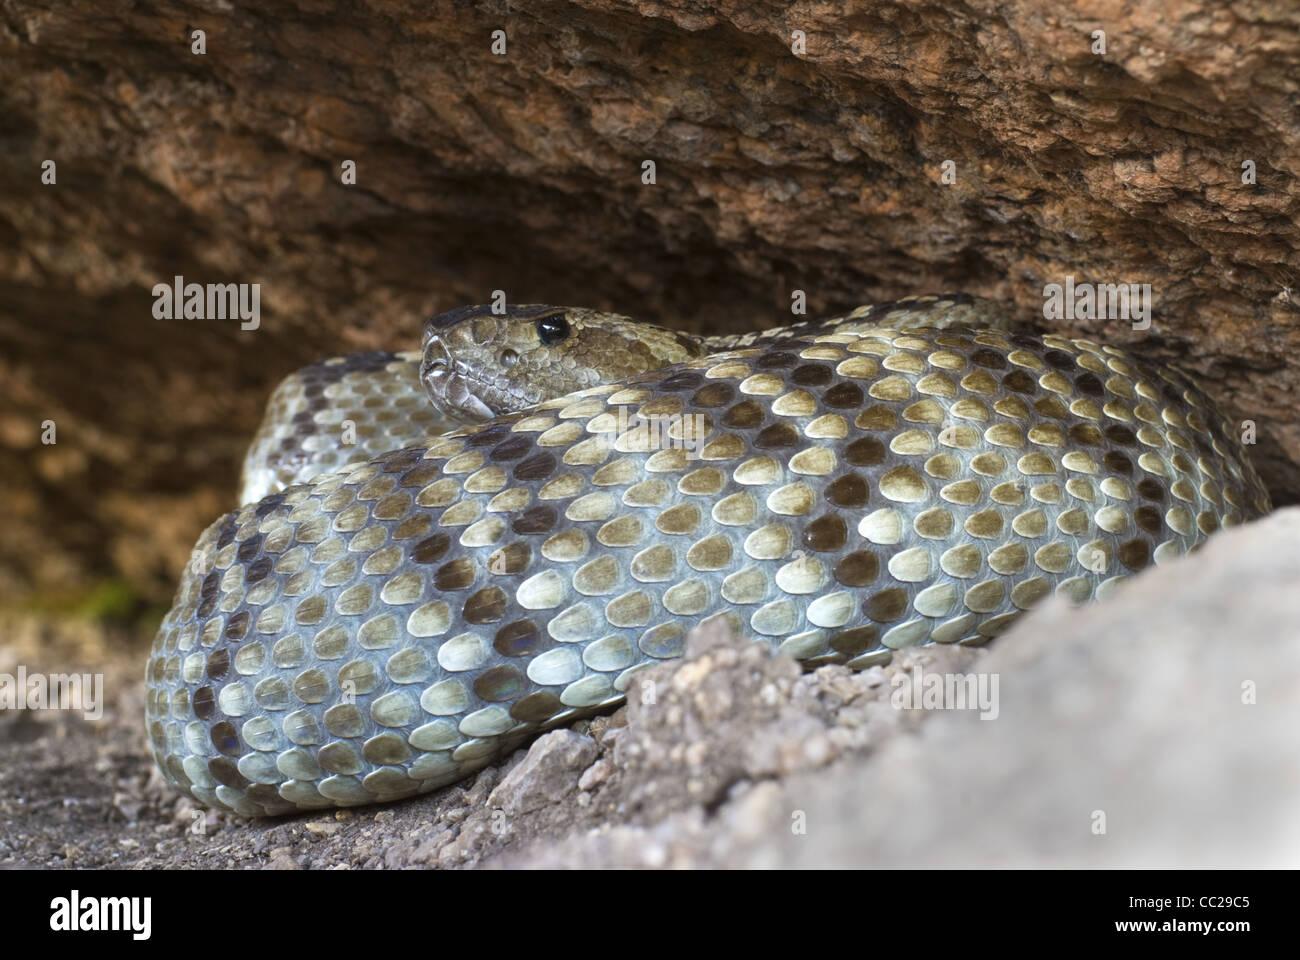 Northern Black-tailed Rattlesnake, (Crotalus molossus molossus), Sandia Mountains, Bernalillio county, New Mexico, Stock Photo